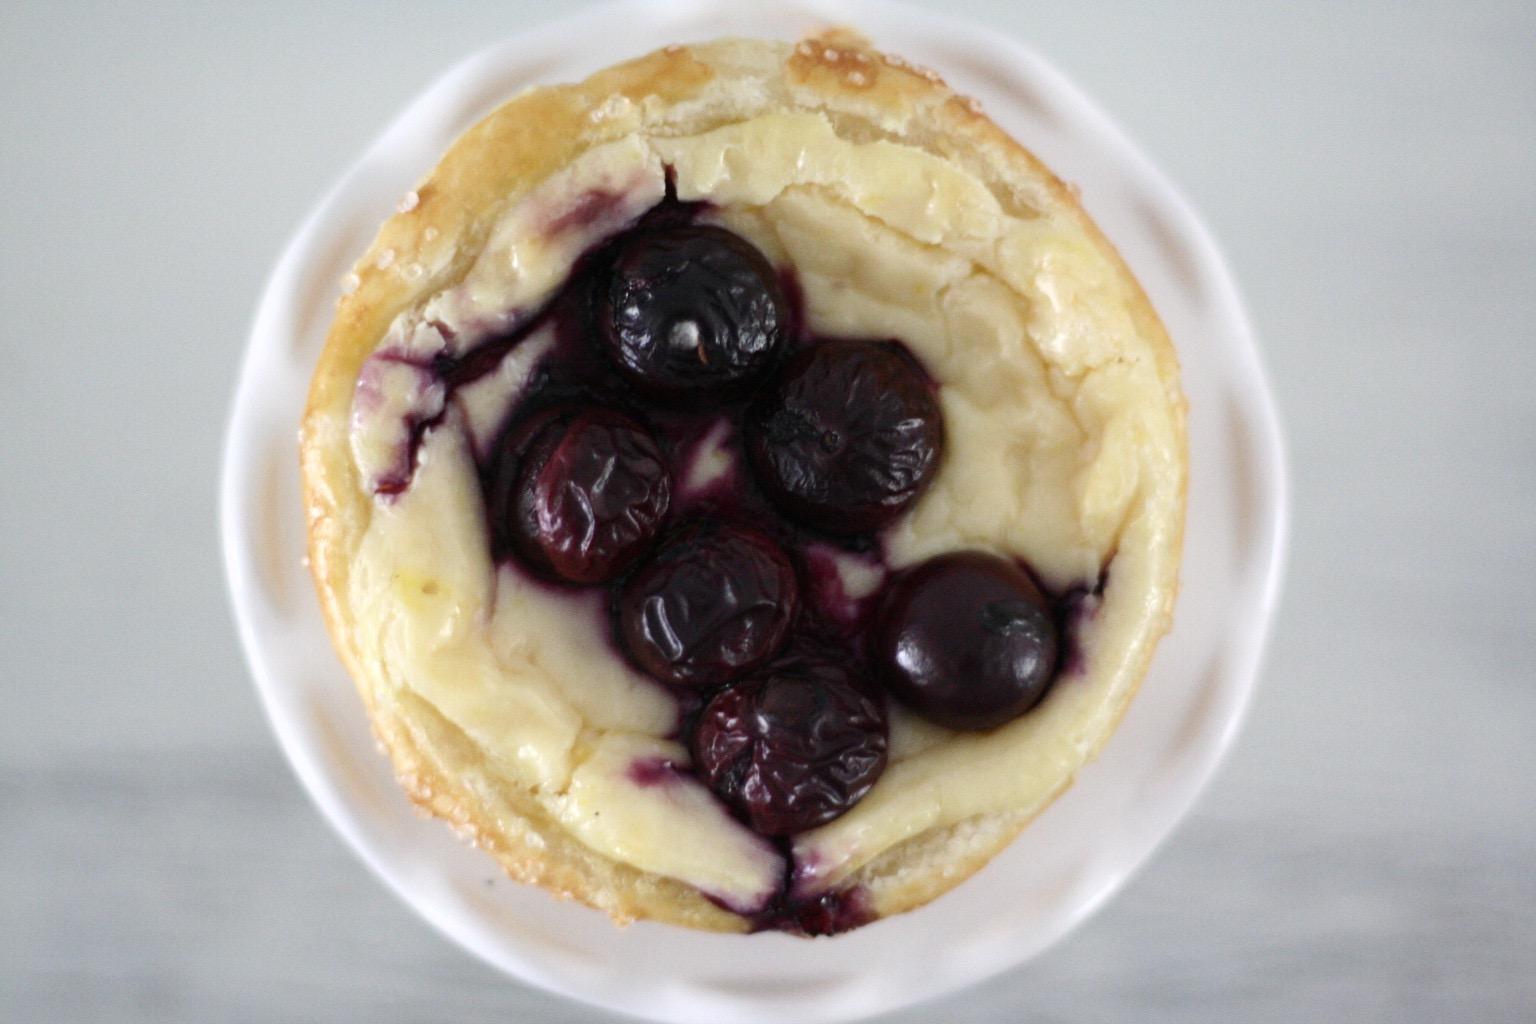 Recipe: Fruit & Cream Cheese Pastry